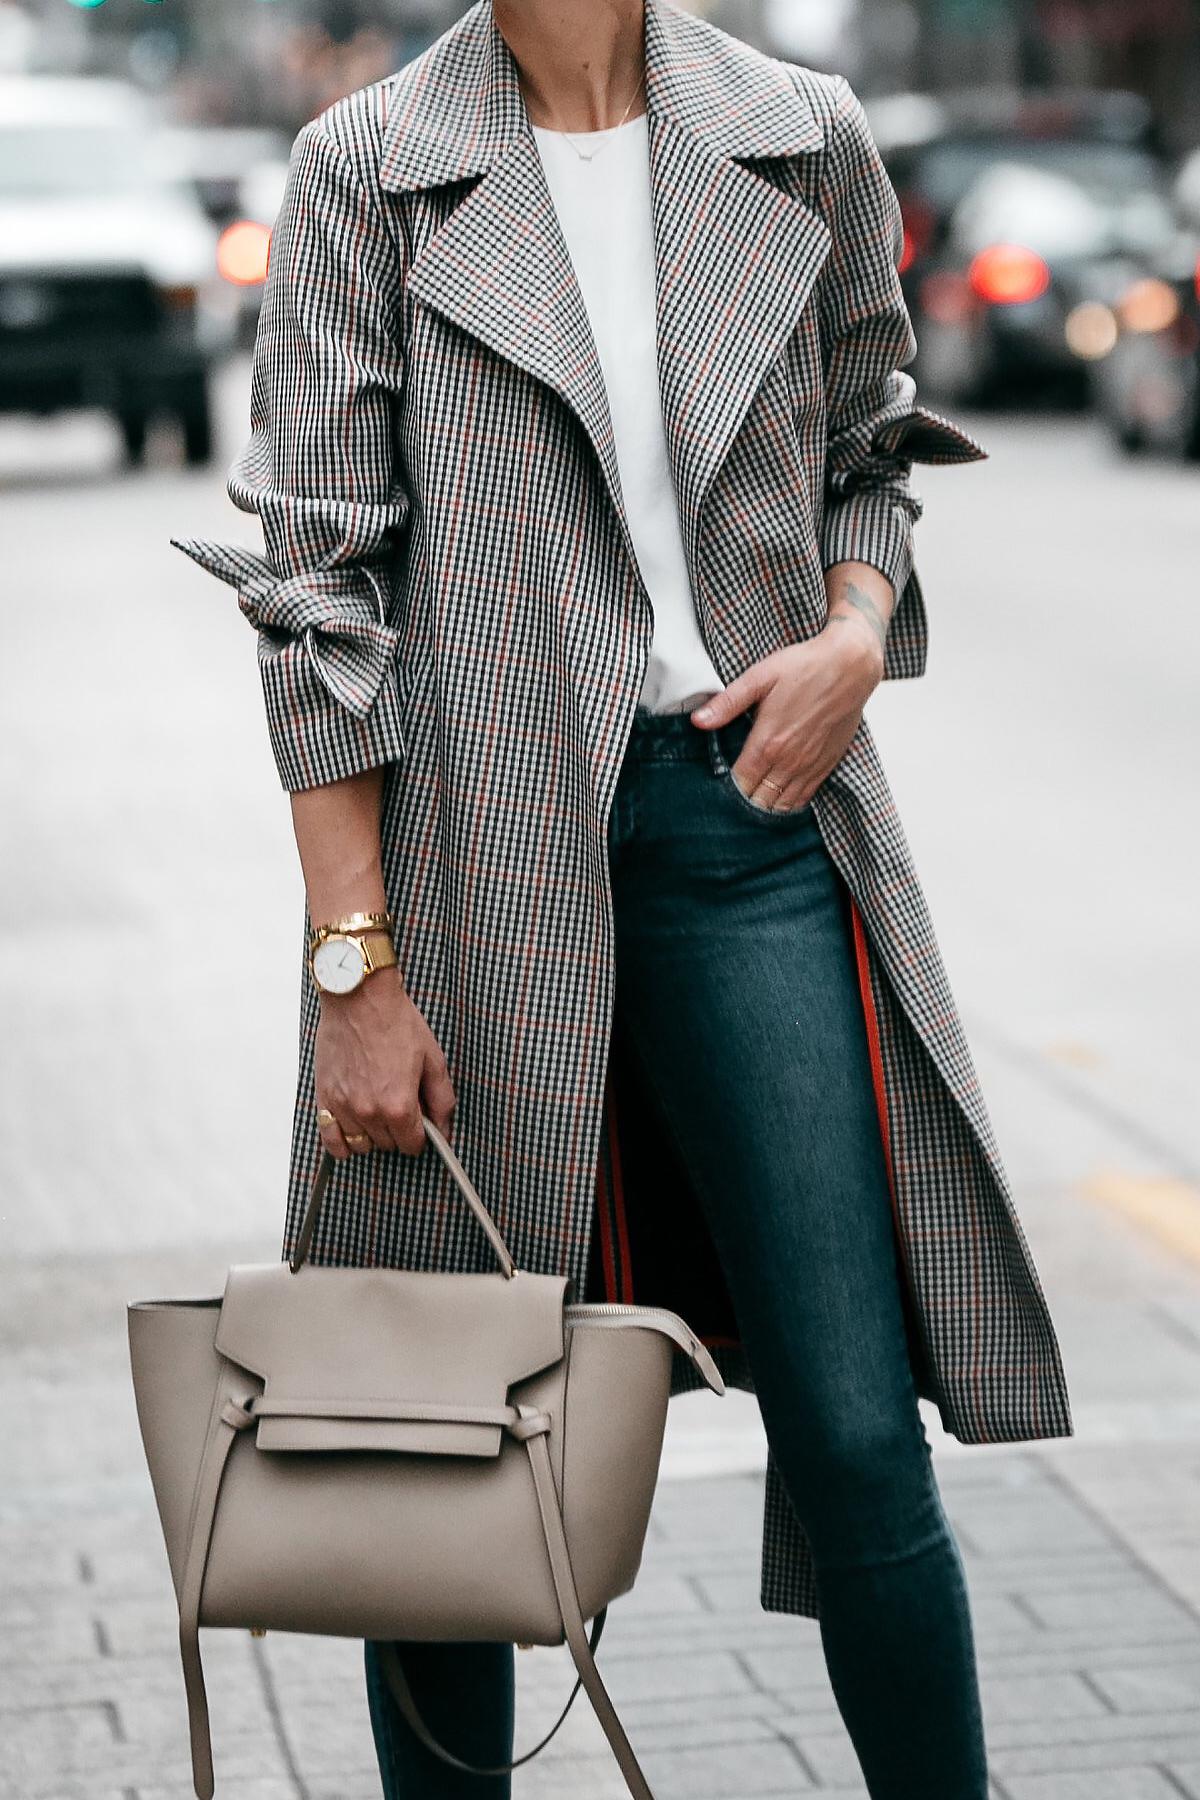 Topshop Plaid Trench Coat Denim Skinny Jeans Celine Belt Bag Fashion Jackson Dallas Blogger Fashion Blogger Street Style